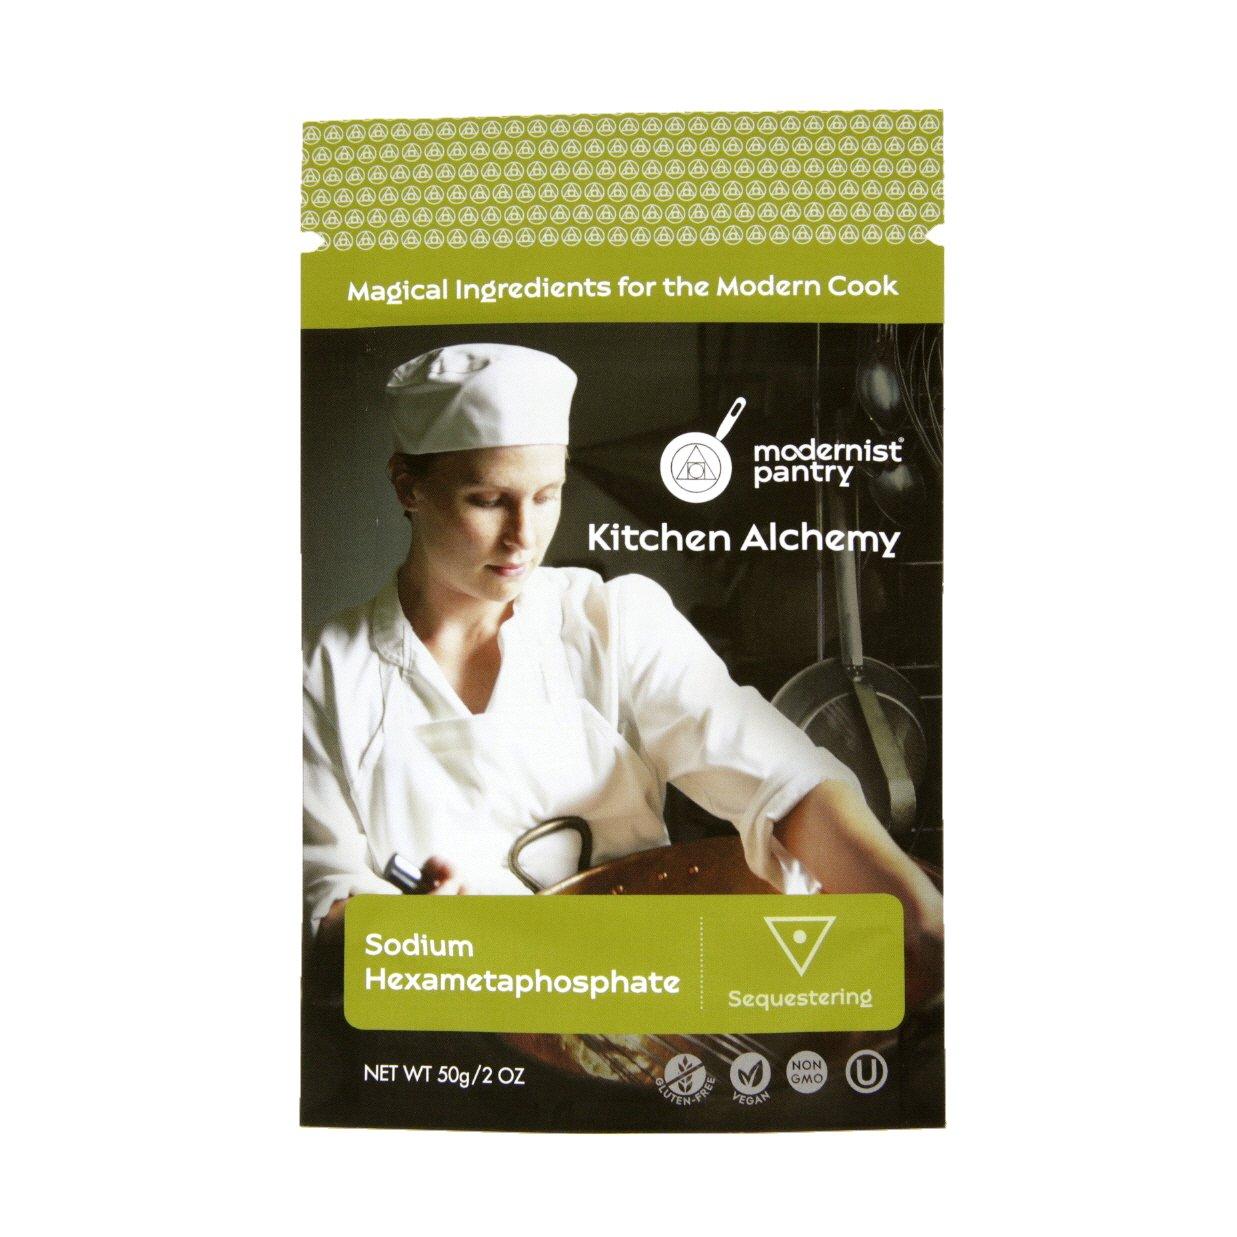 Pure Sodium Hexametaphosphate ⊘ Non-GMO ☮ Vegan ✡ OU Kosher Certified - 50g/2oz